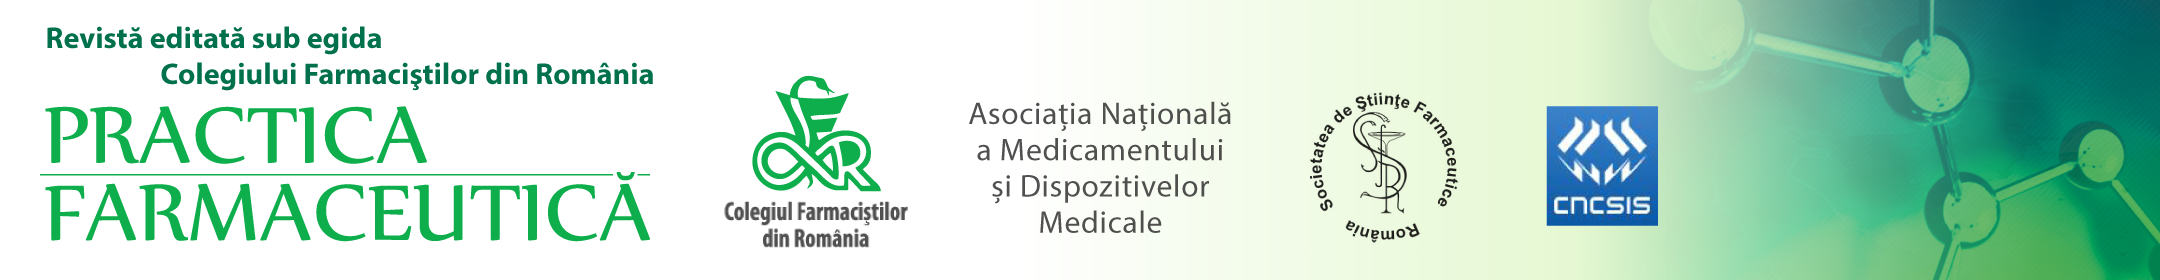 Revista Practica Farmaceutica